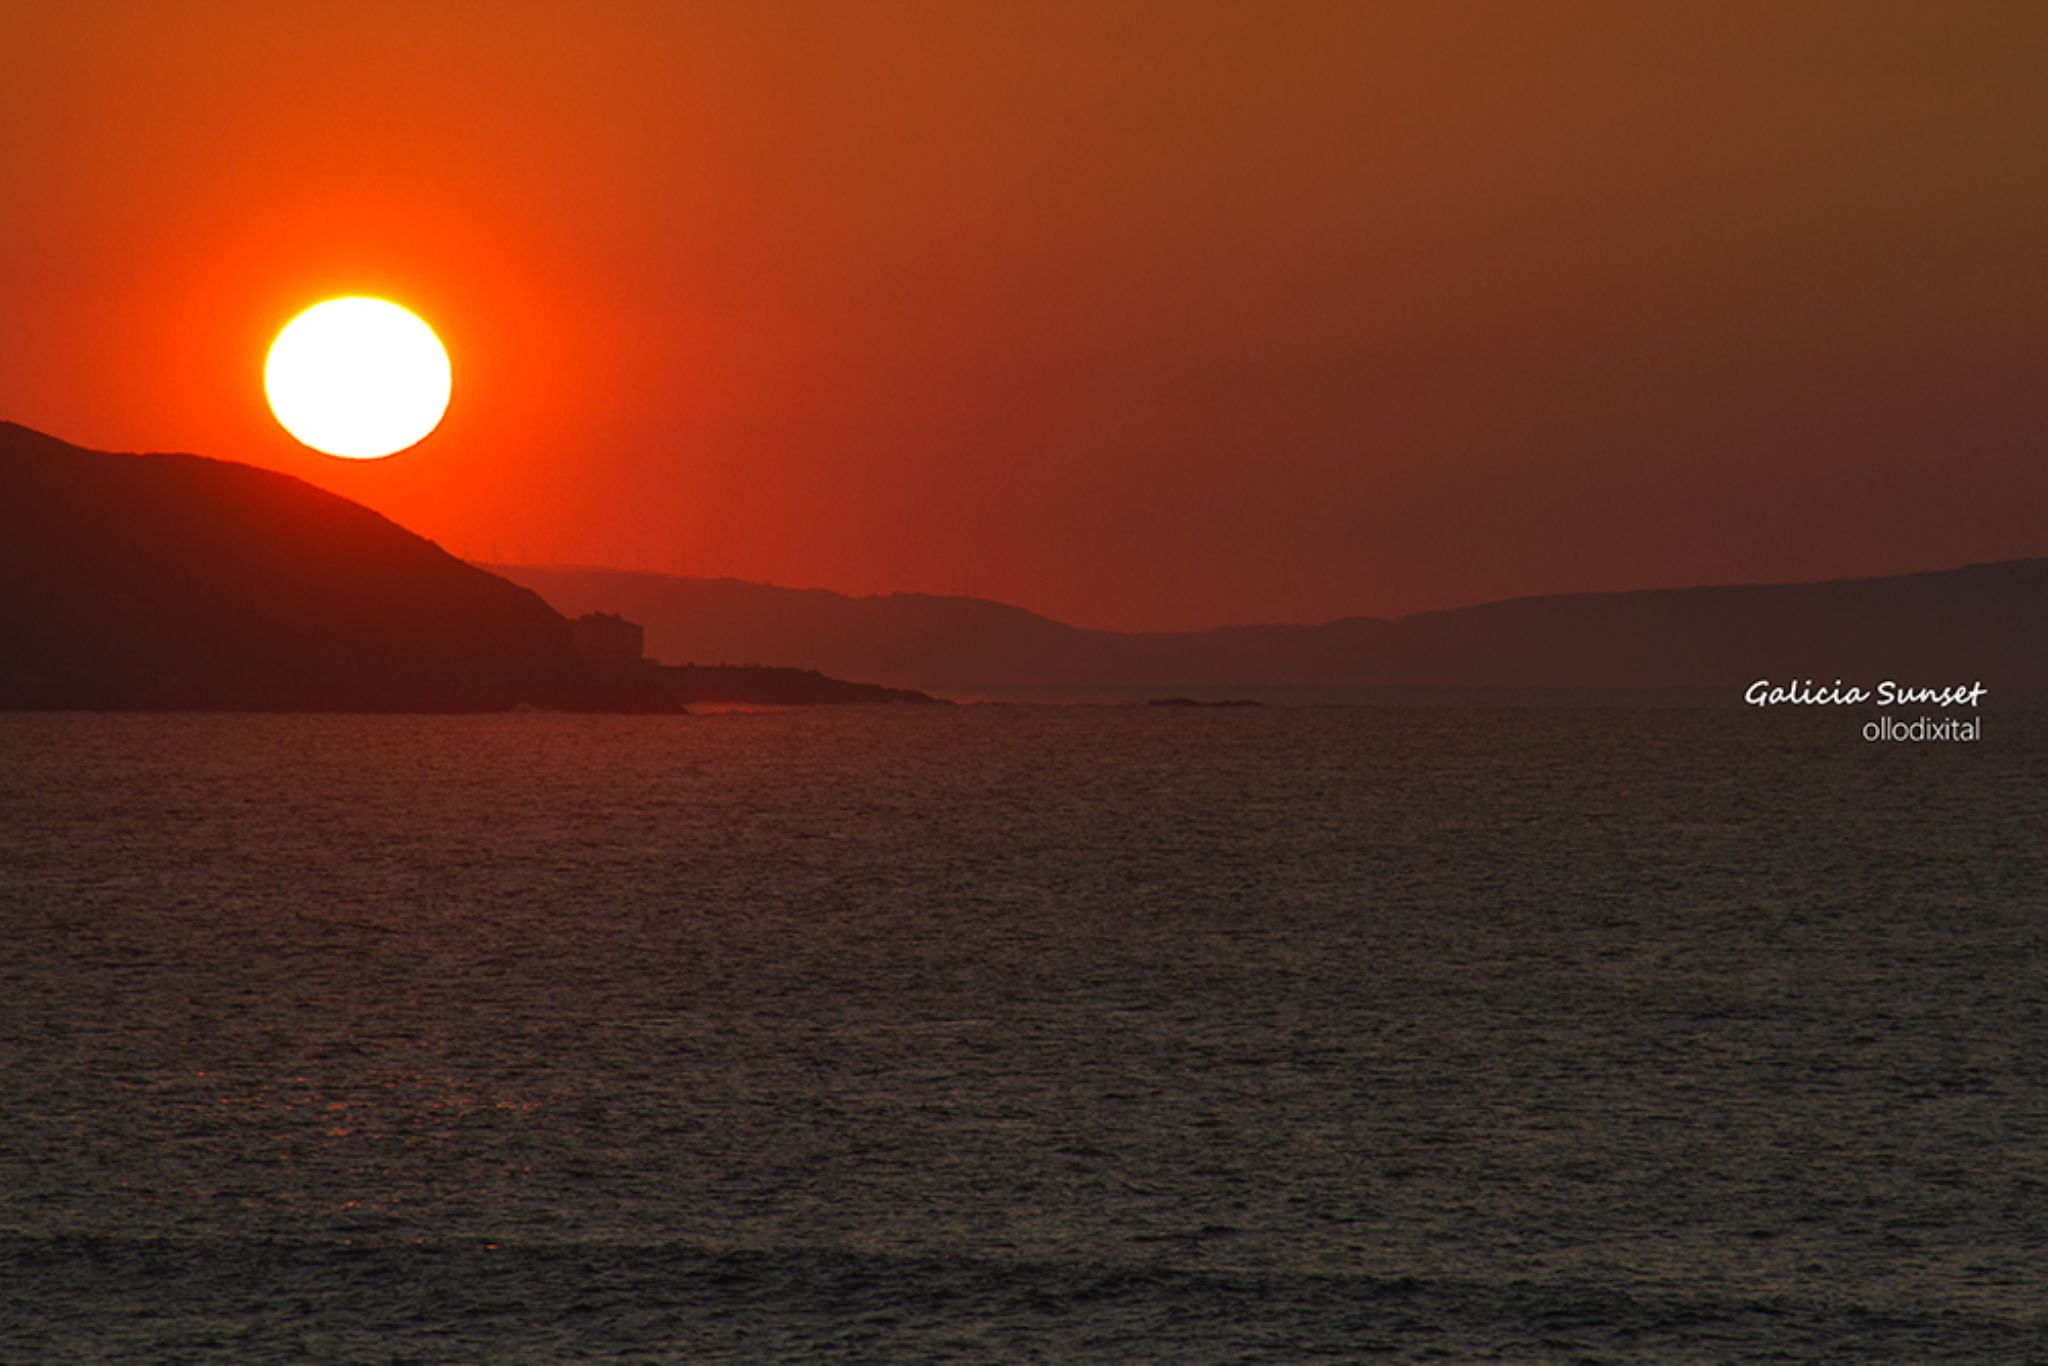 Galicia Sunset by OlloDixital